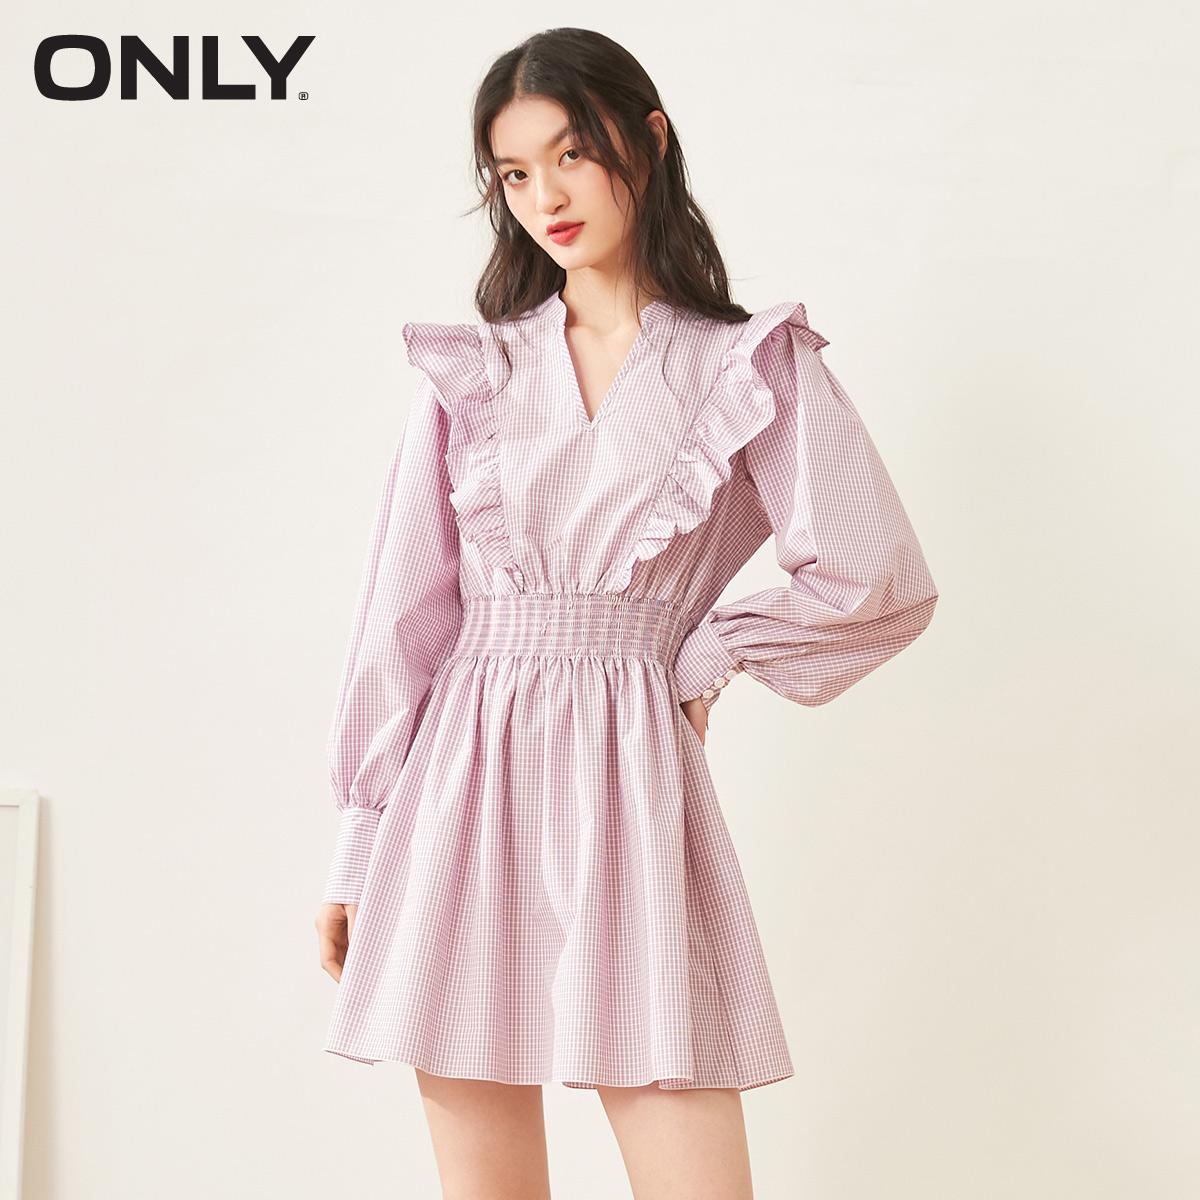 ONLY春季新款时尚气质收腰花边格子短款连衣裙女|120307040